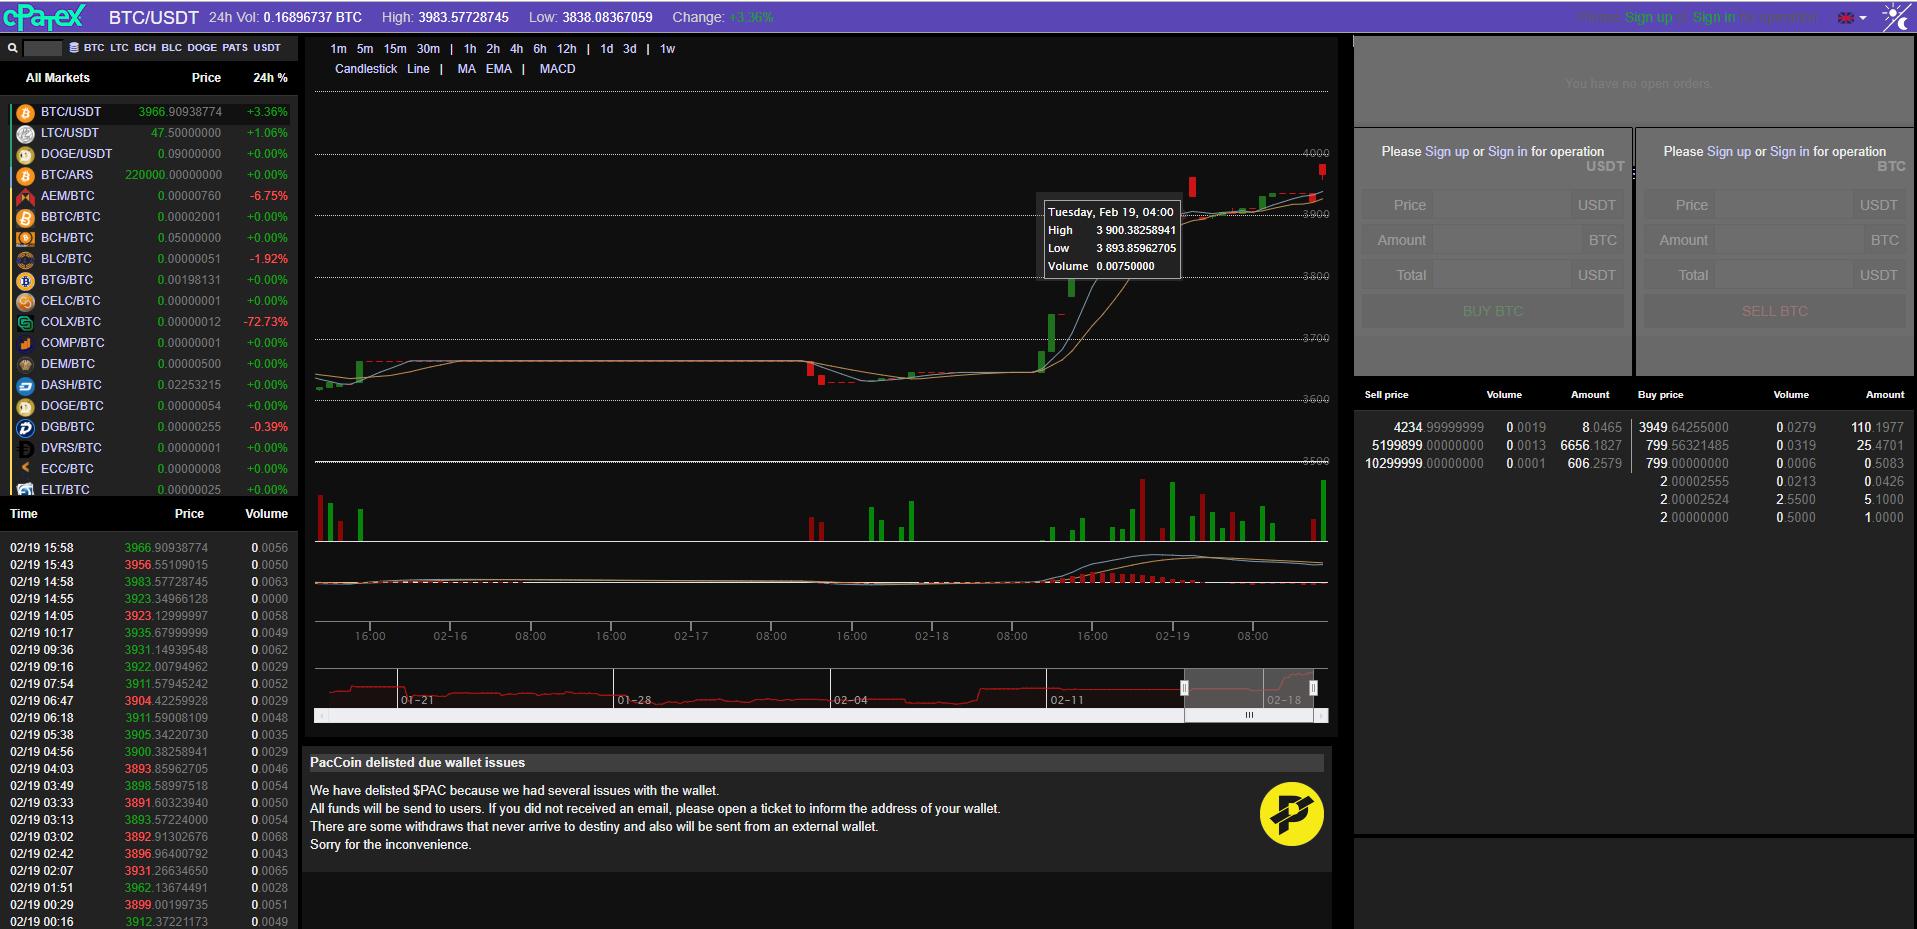 C-Patex Trading View